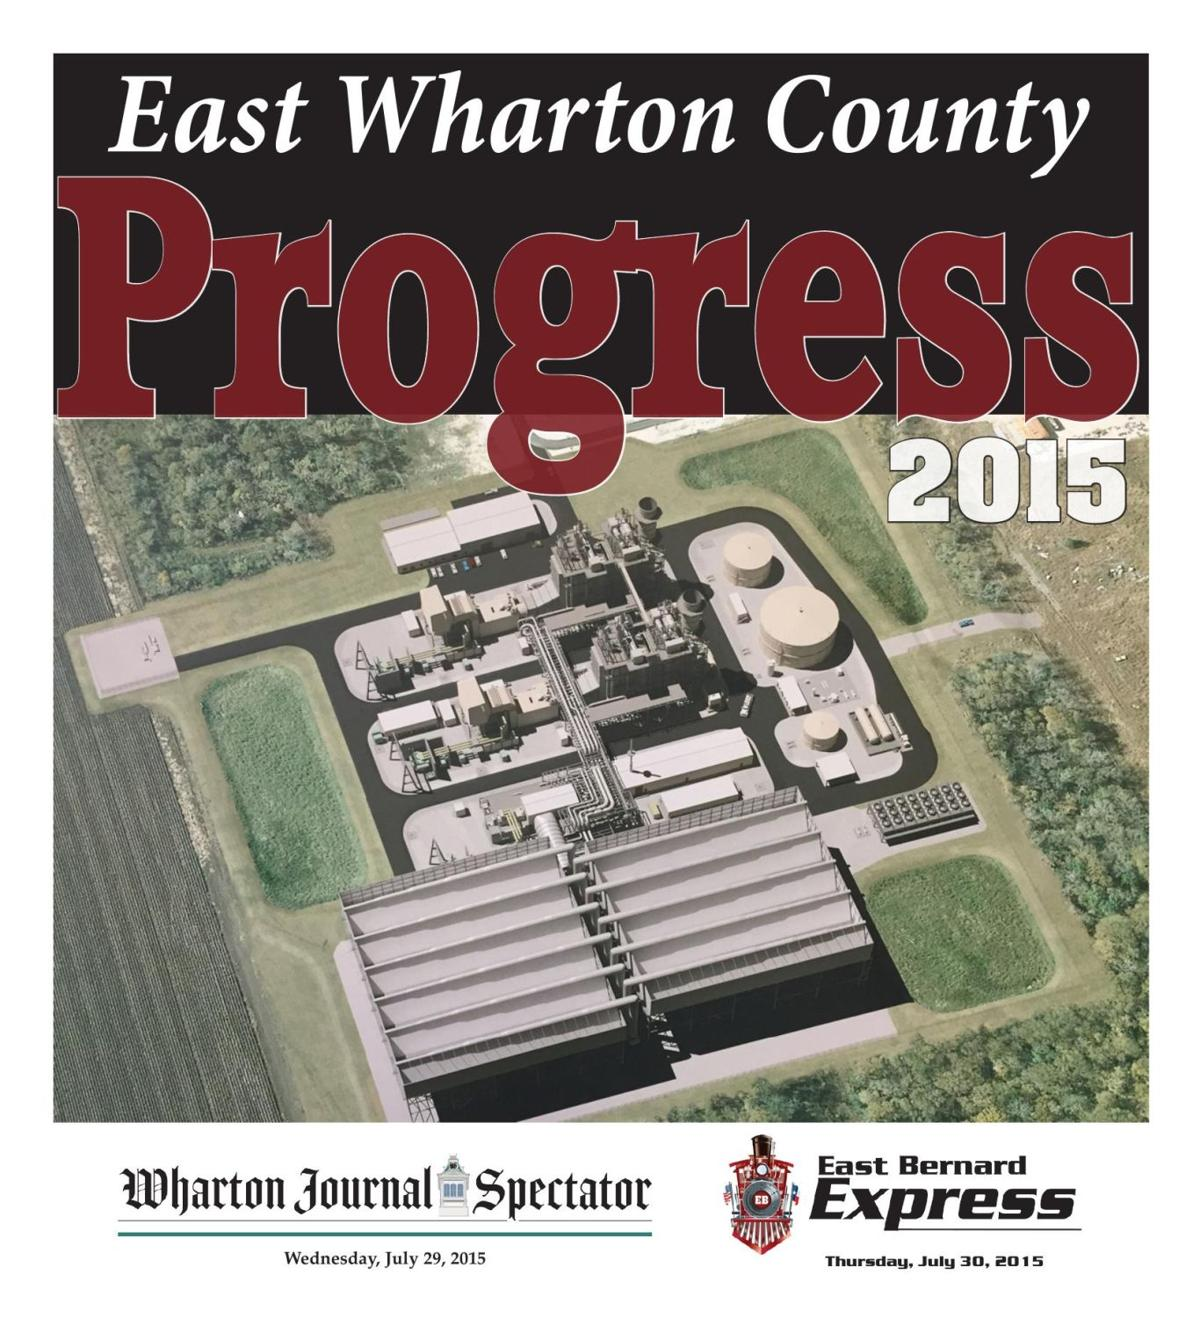 2015 East Wharton County Progress